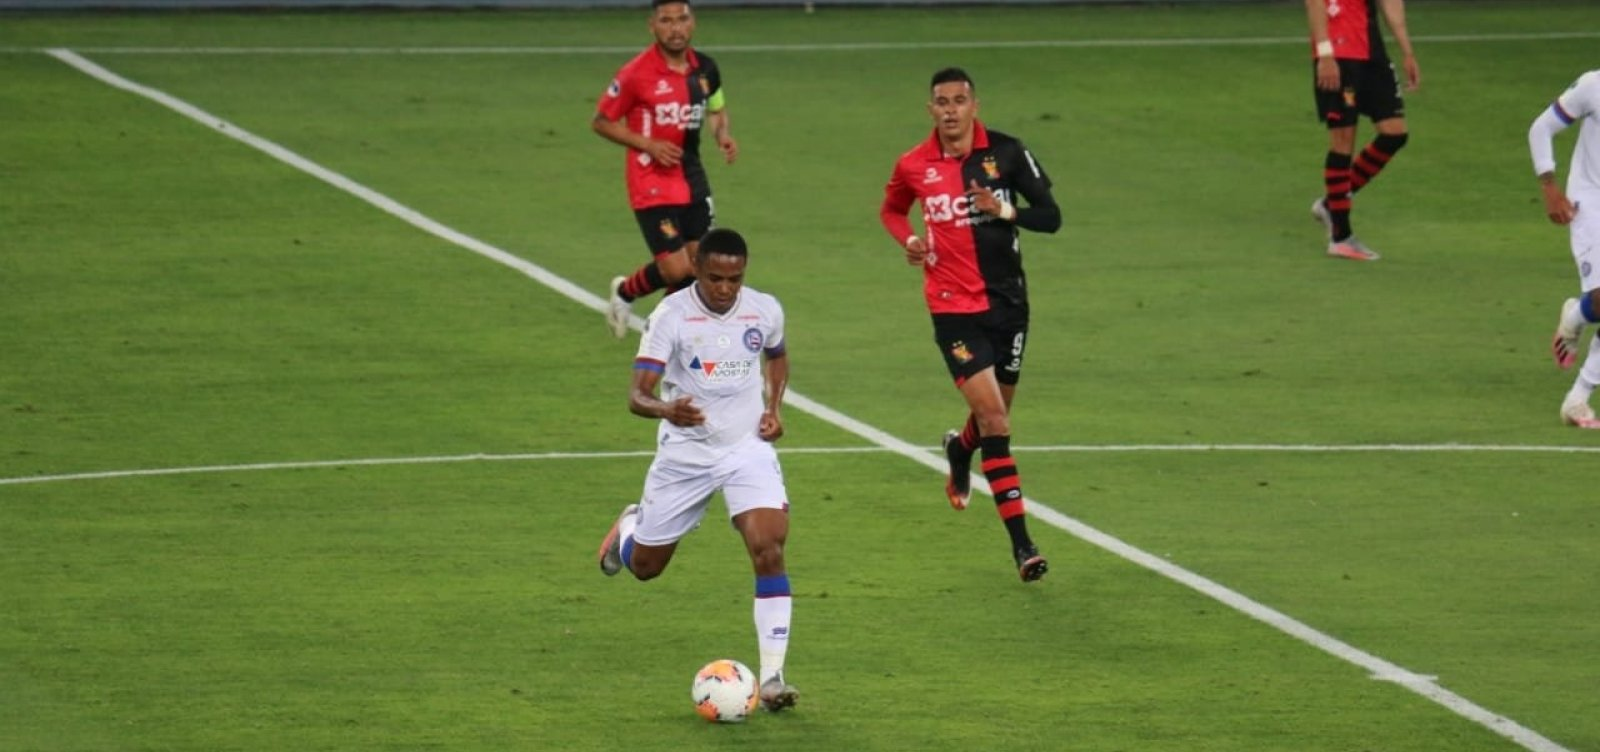 [Bahia perde para Melgar na primeira partida da segunda fase da Sul-Americana]